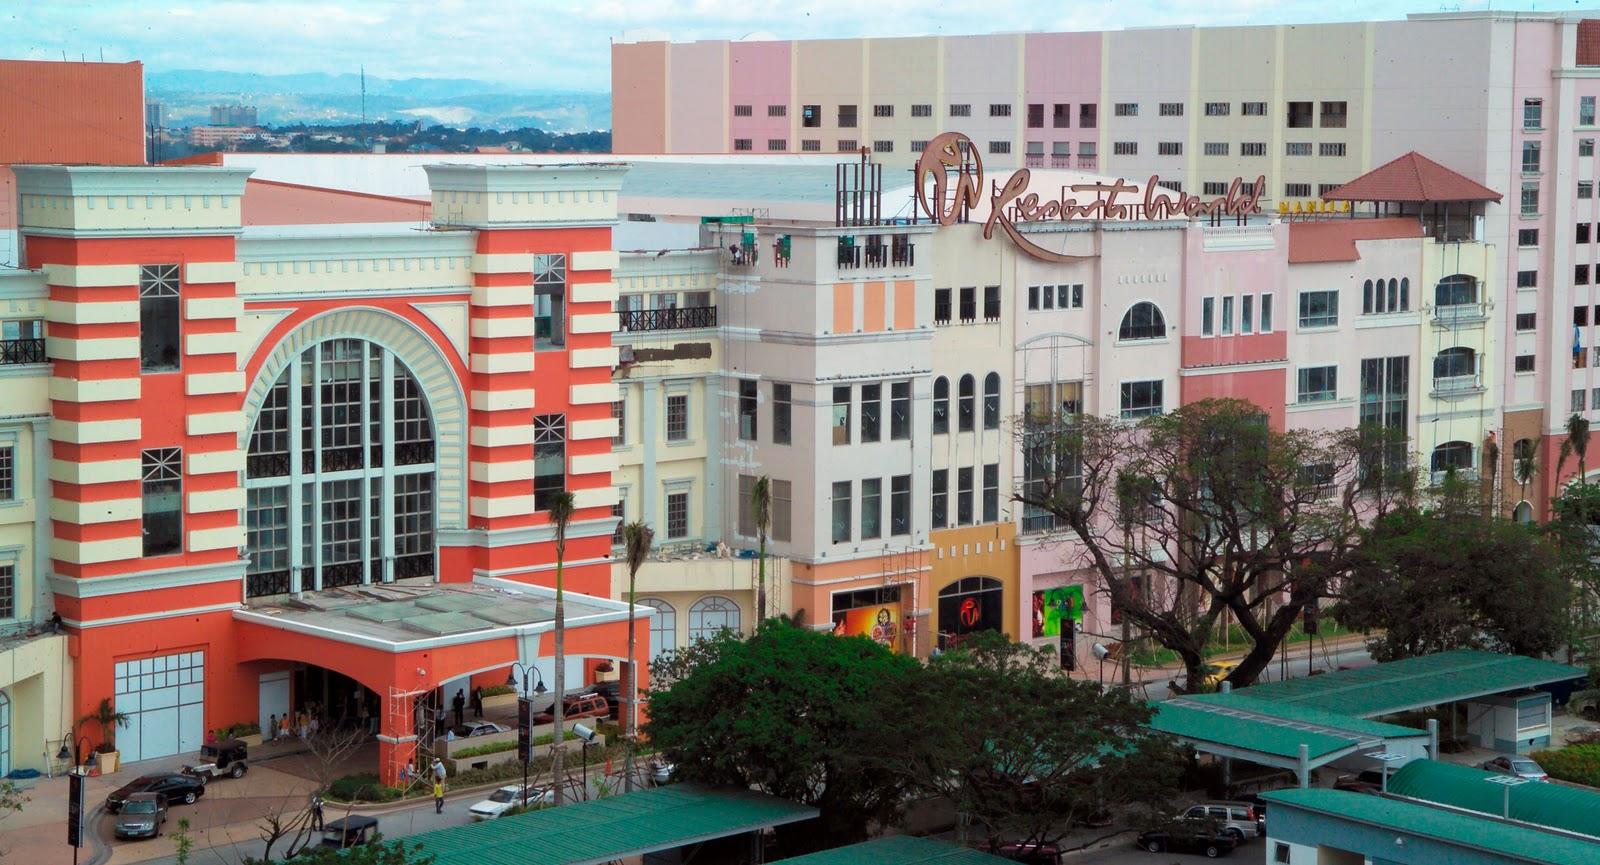 Manila (MNL-Ninoy Aquino Intl.) Hotels with Parking | Book